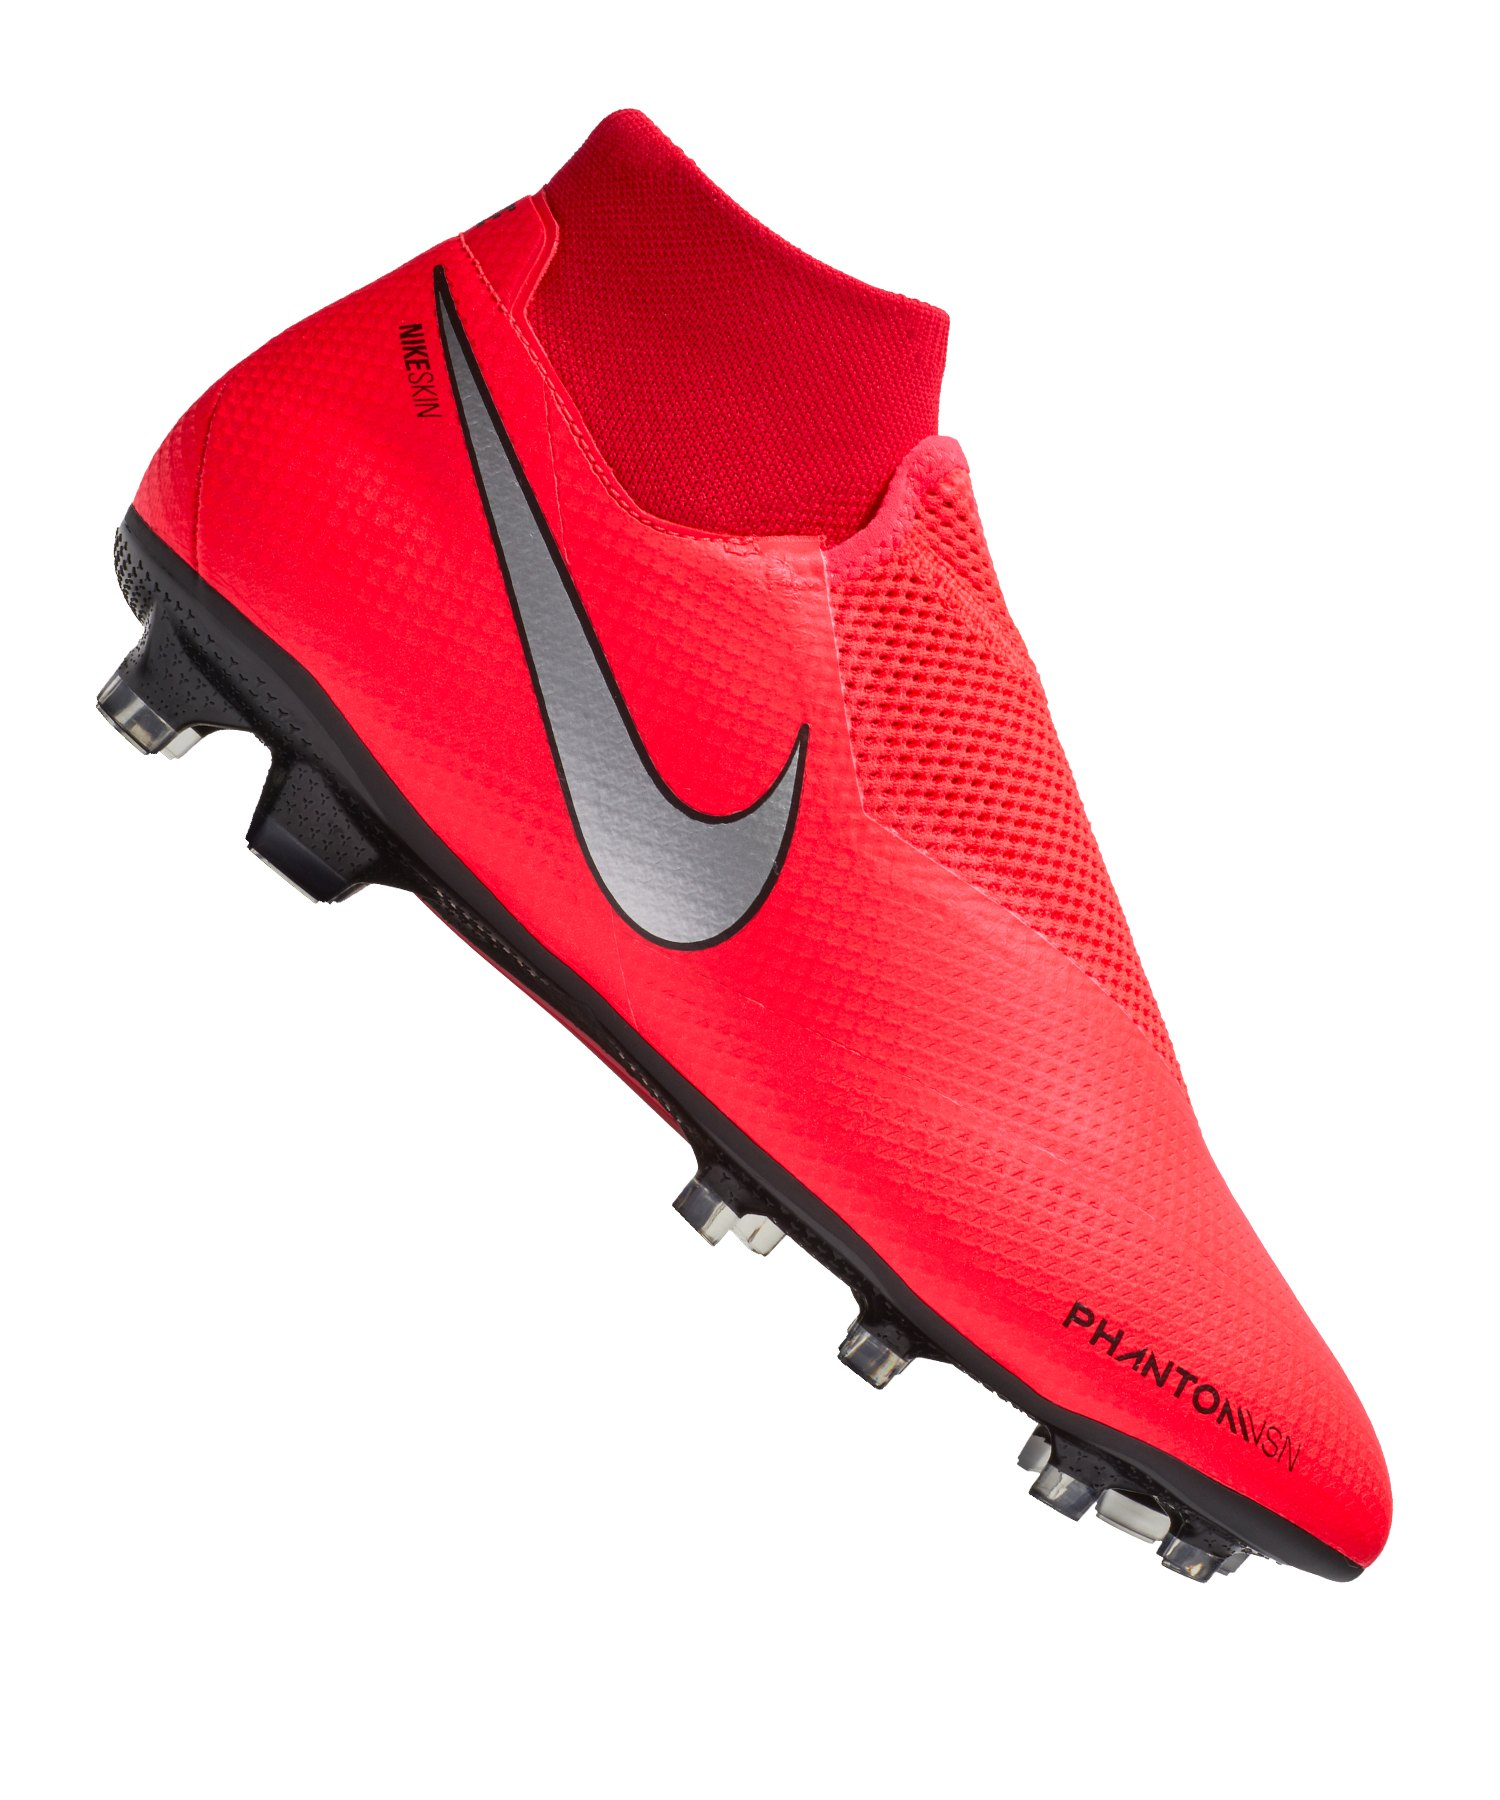 Phantom Vision Pro F600 Nike Rot Fg l1FcKJ